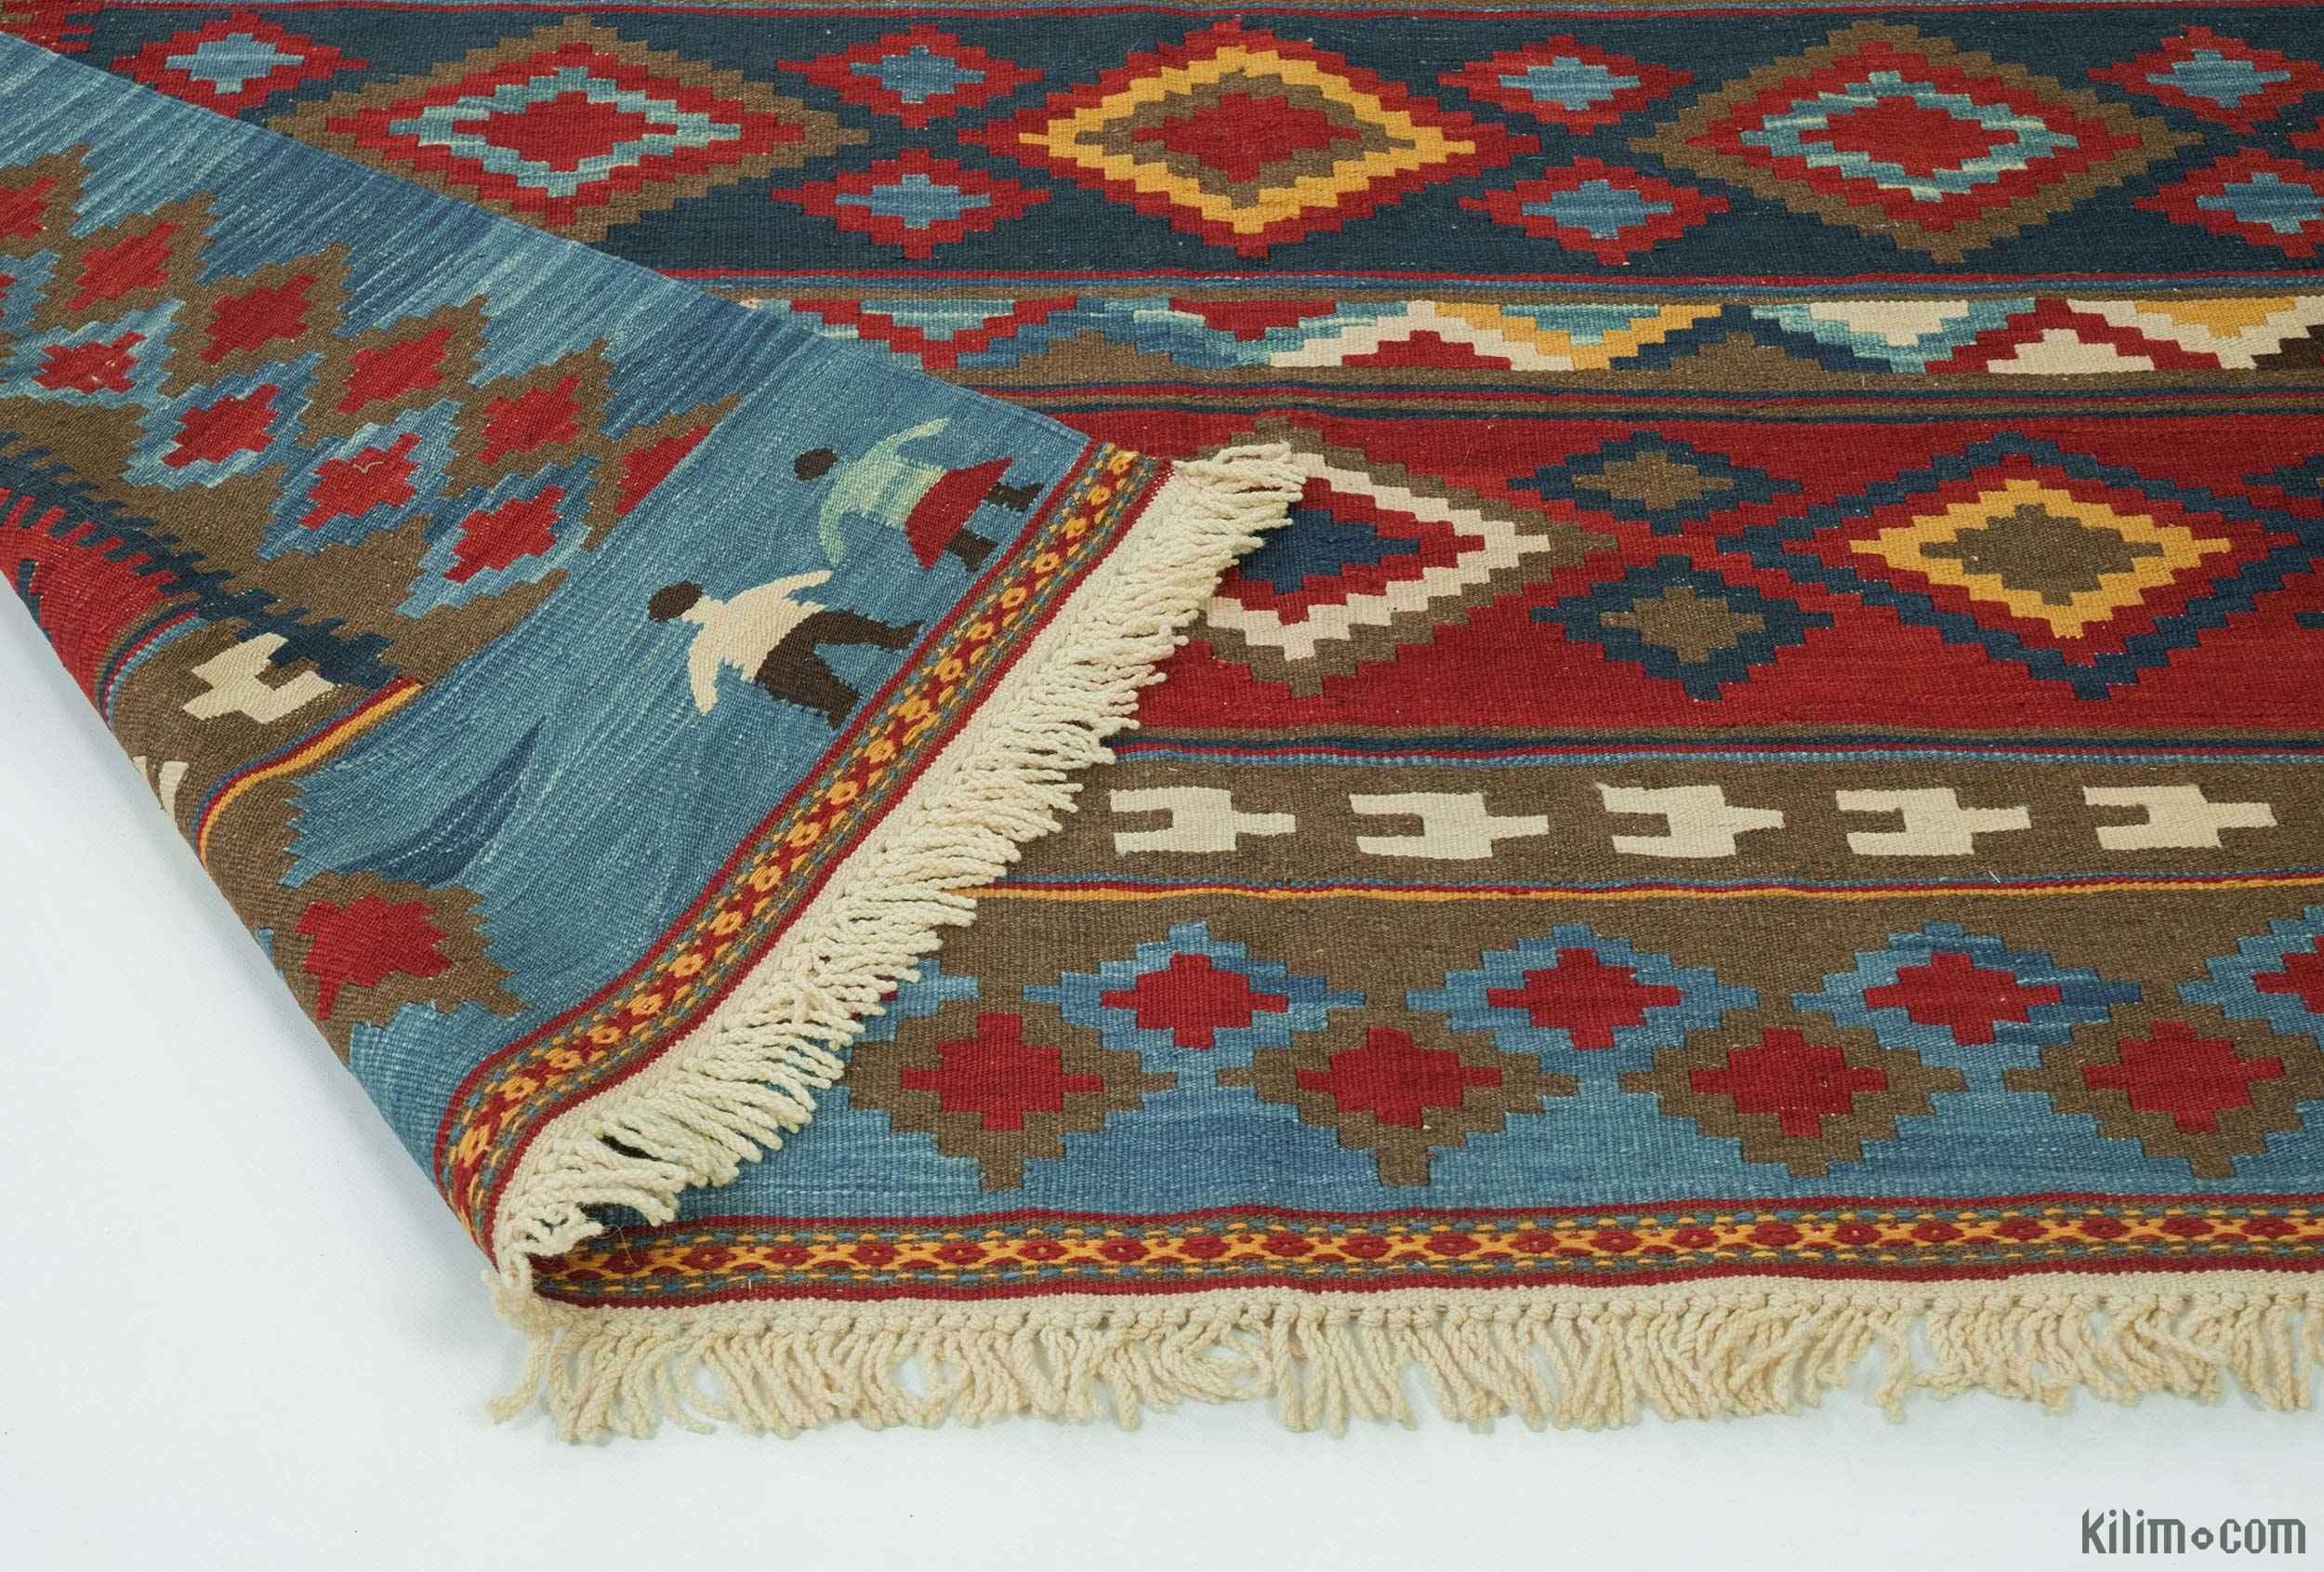 K0015750 Multicolor New Handwoven Turkish Kilim Rug 11